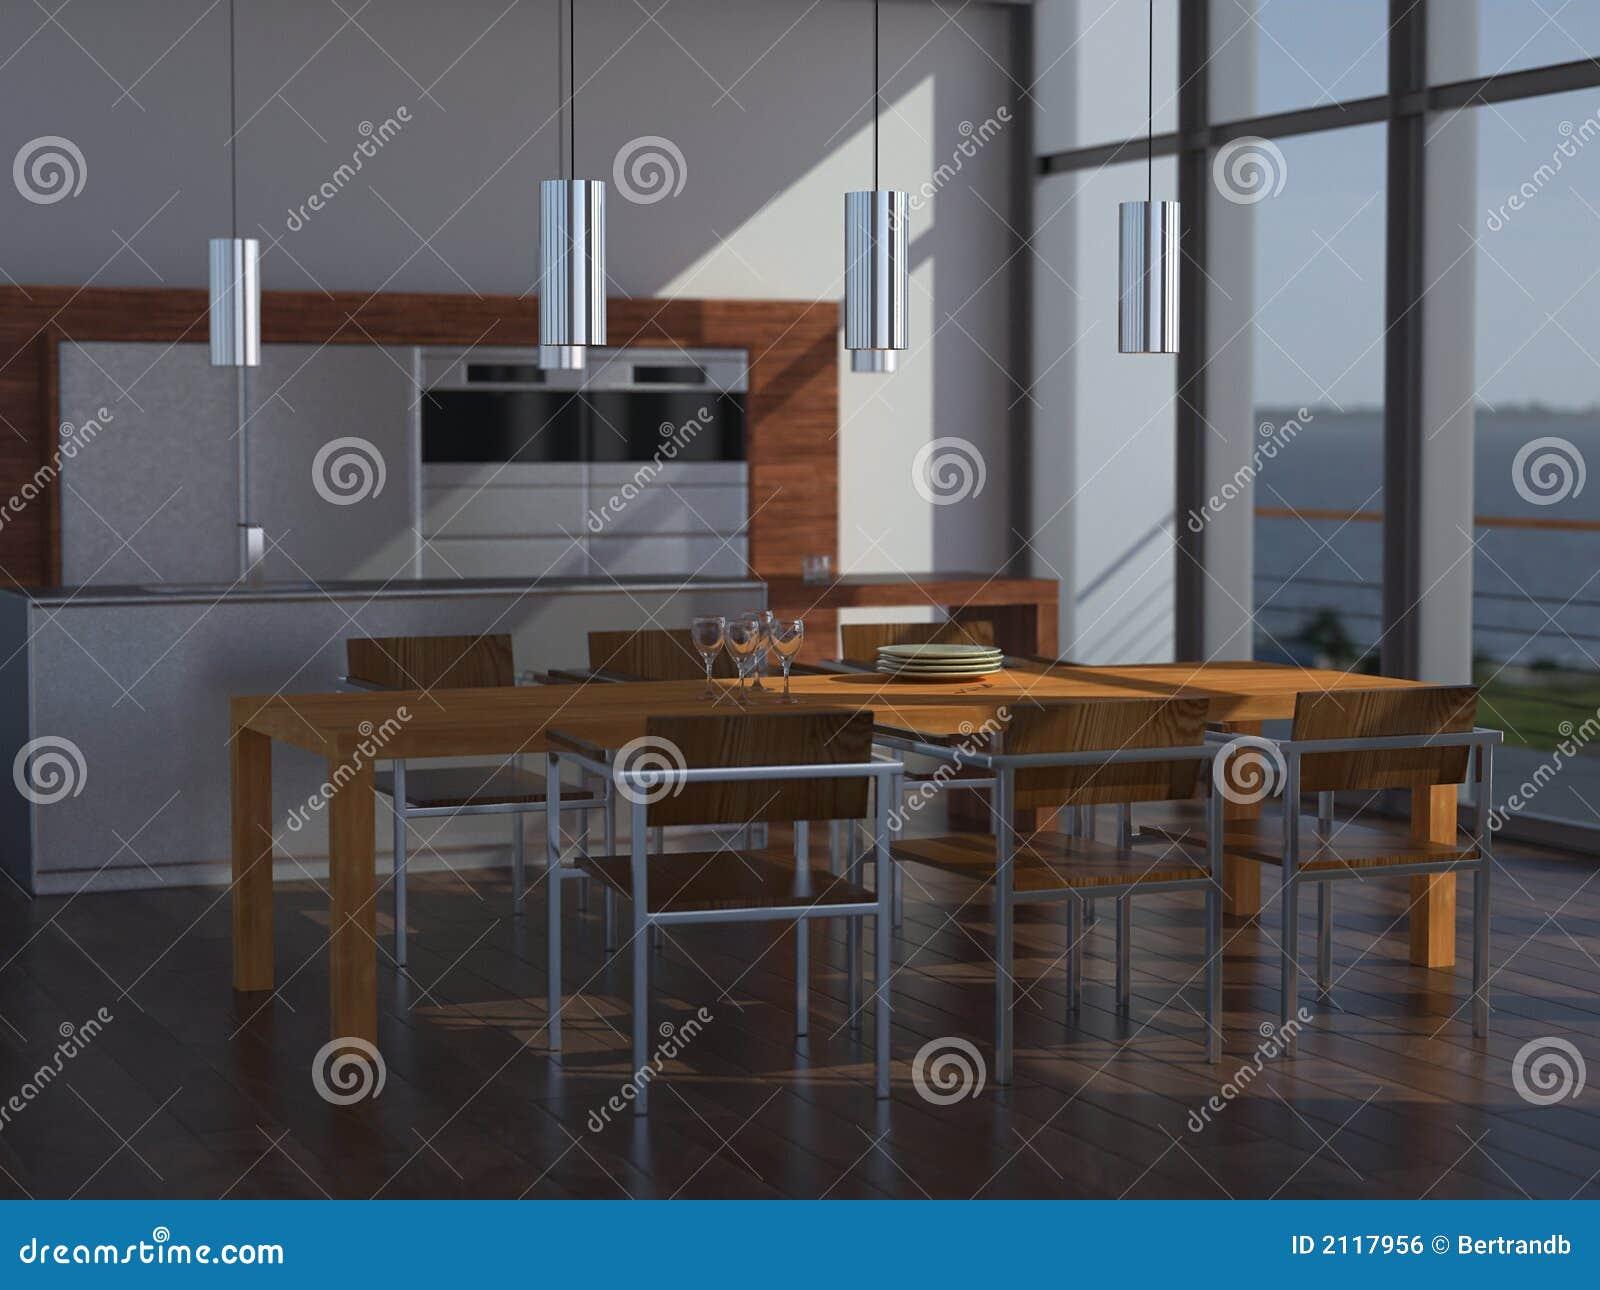 Cucina E Sala Da Pranzo Di Lusso Immagine Stock Libera Da Diritti  #88613E 1300 1065 Sala Da Pranzo Luigi Xv